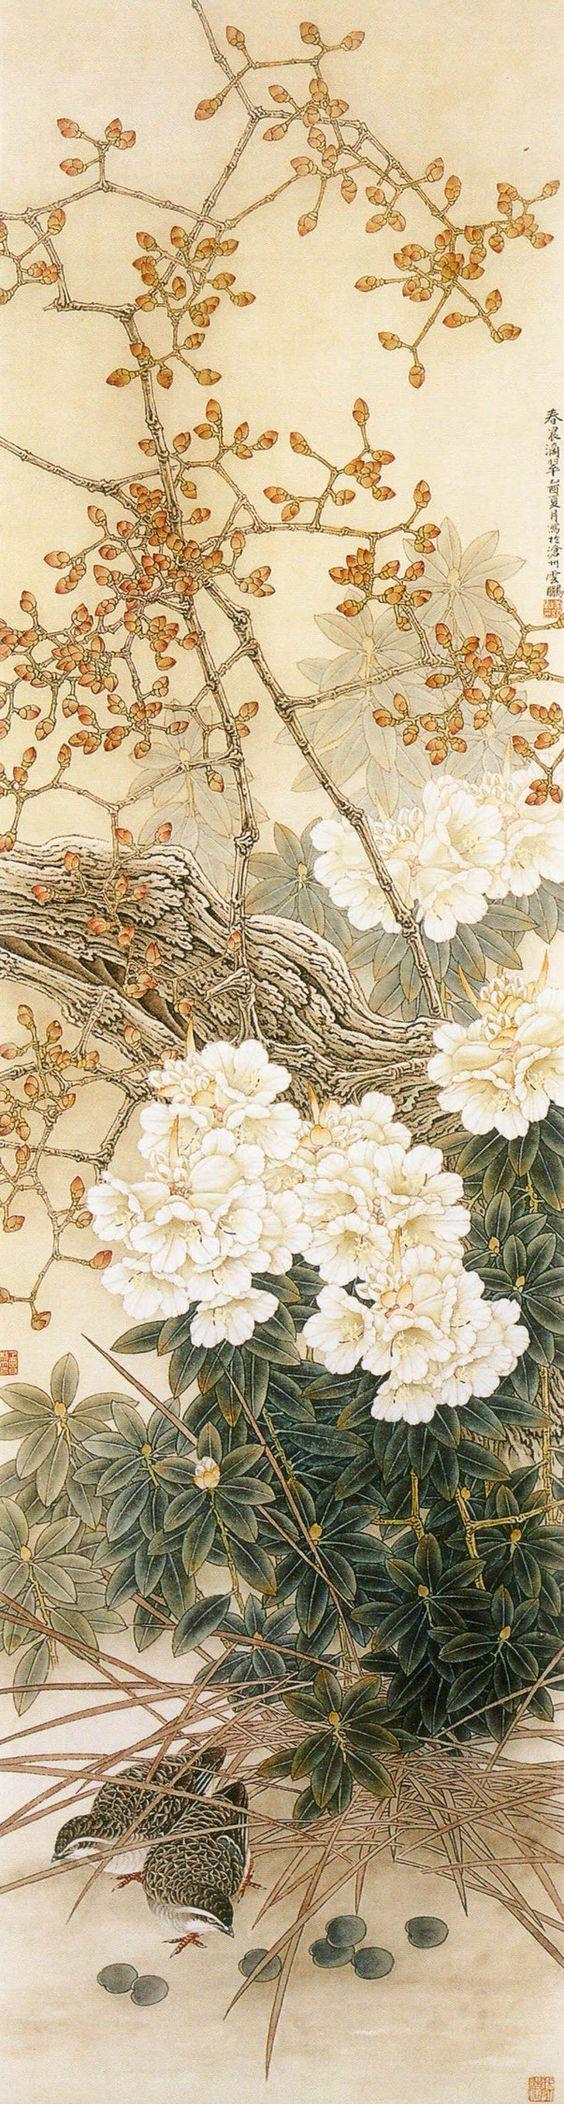 Japanese art on http://cuadernoderetazos.files.wordpress.com/2013/03/tian-yunpeng13.jpg